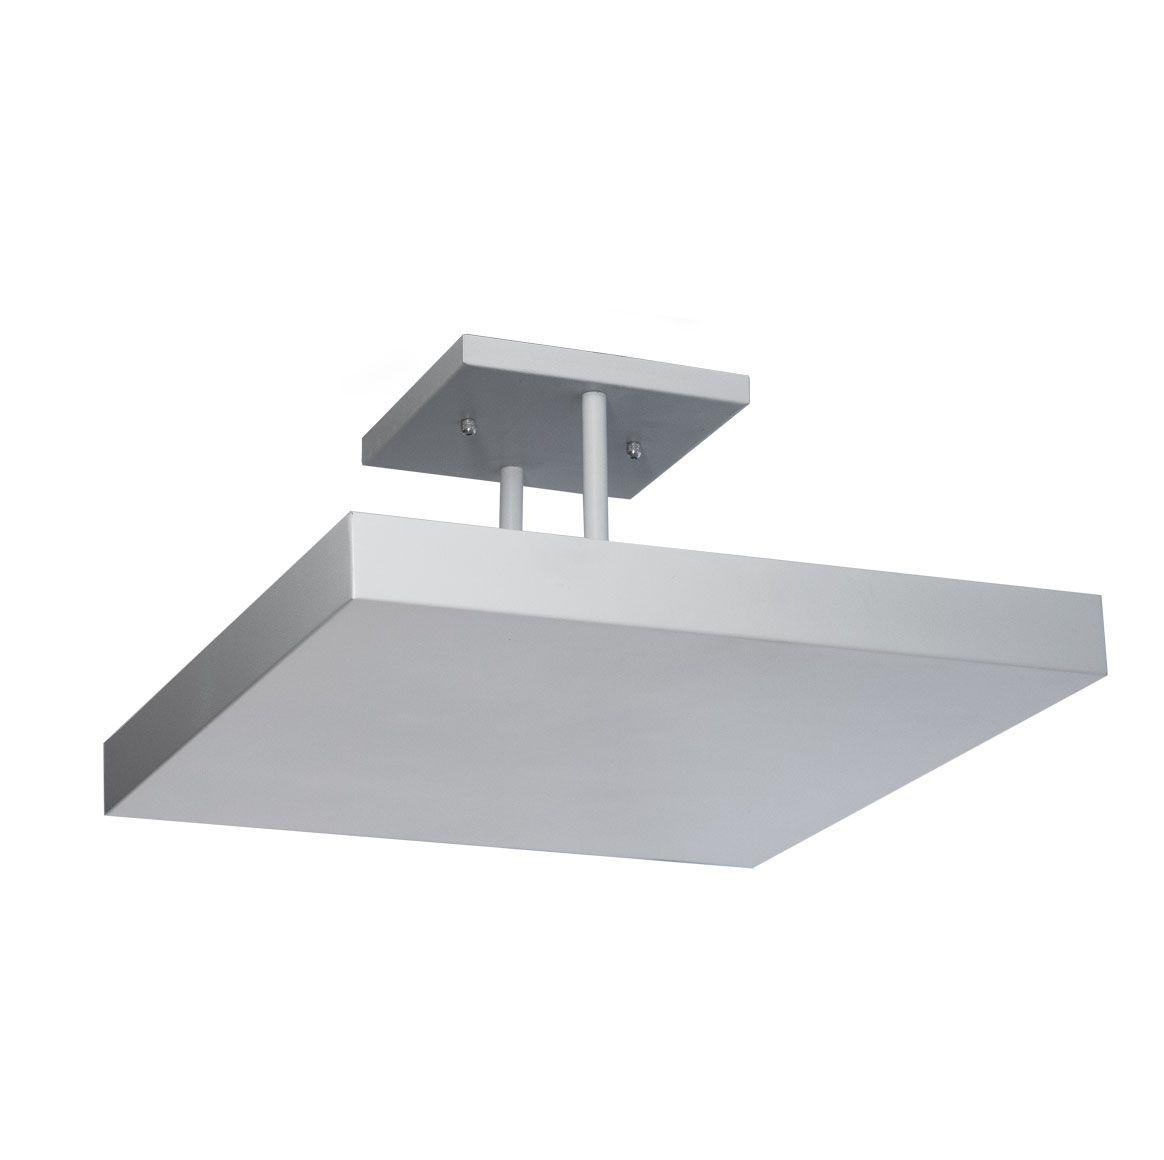 Plafon de sobrepor de luz indireta 20x20cm em alumínio branco texturizado